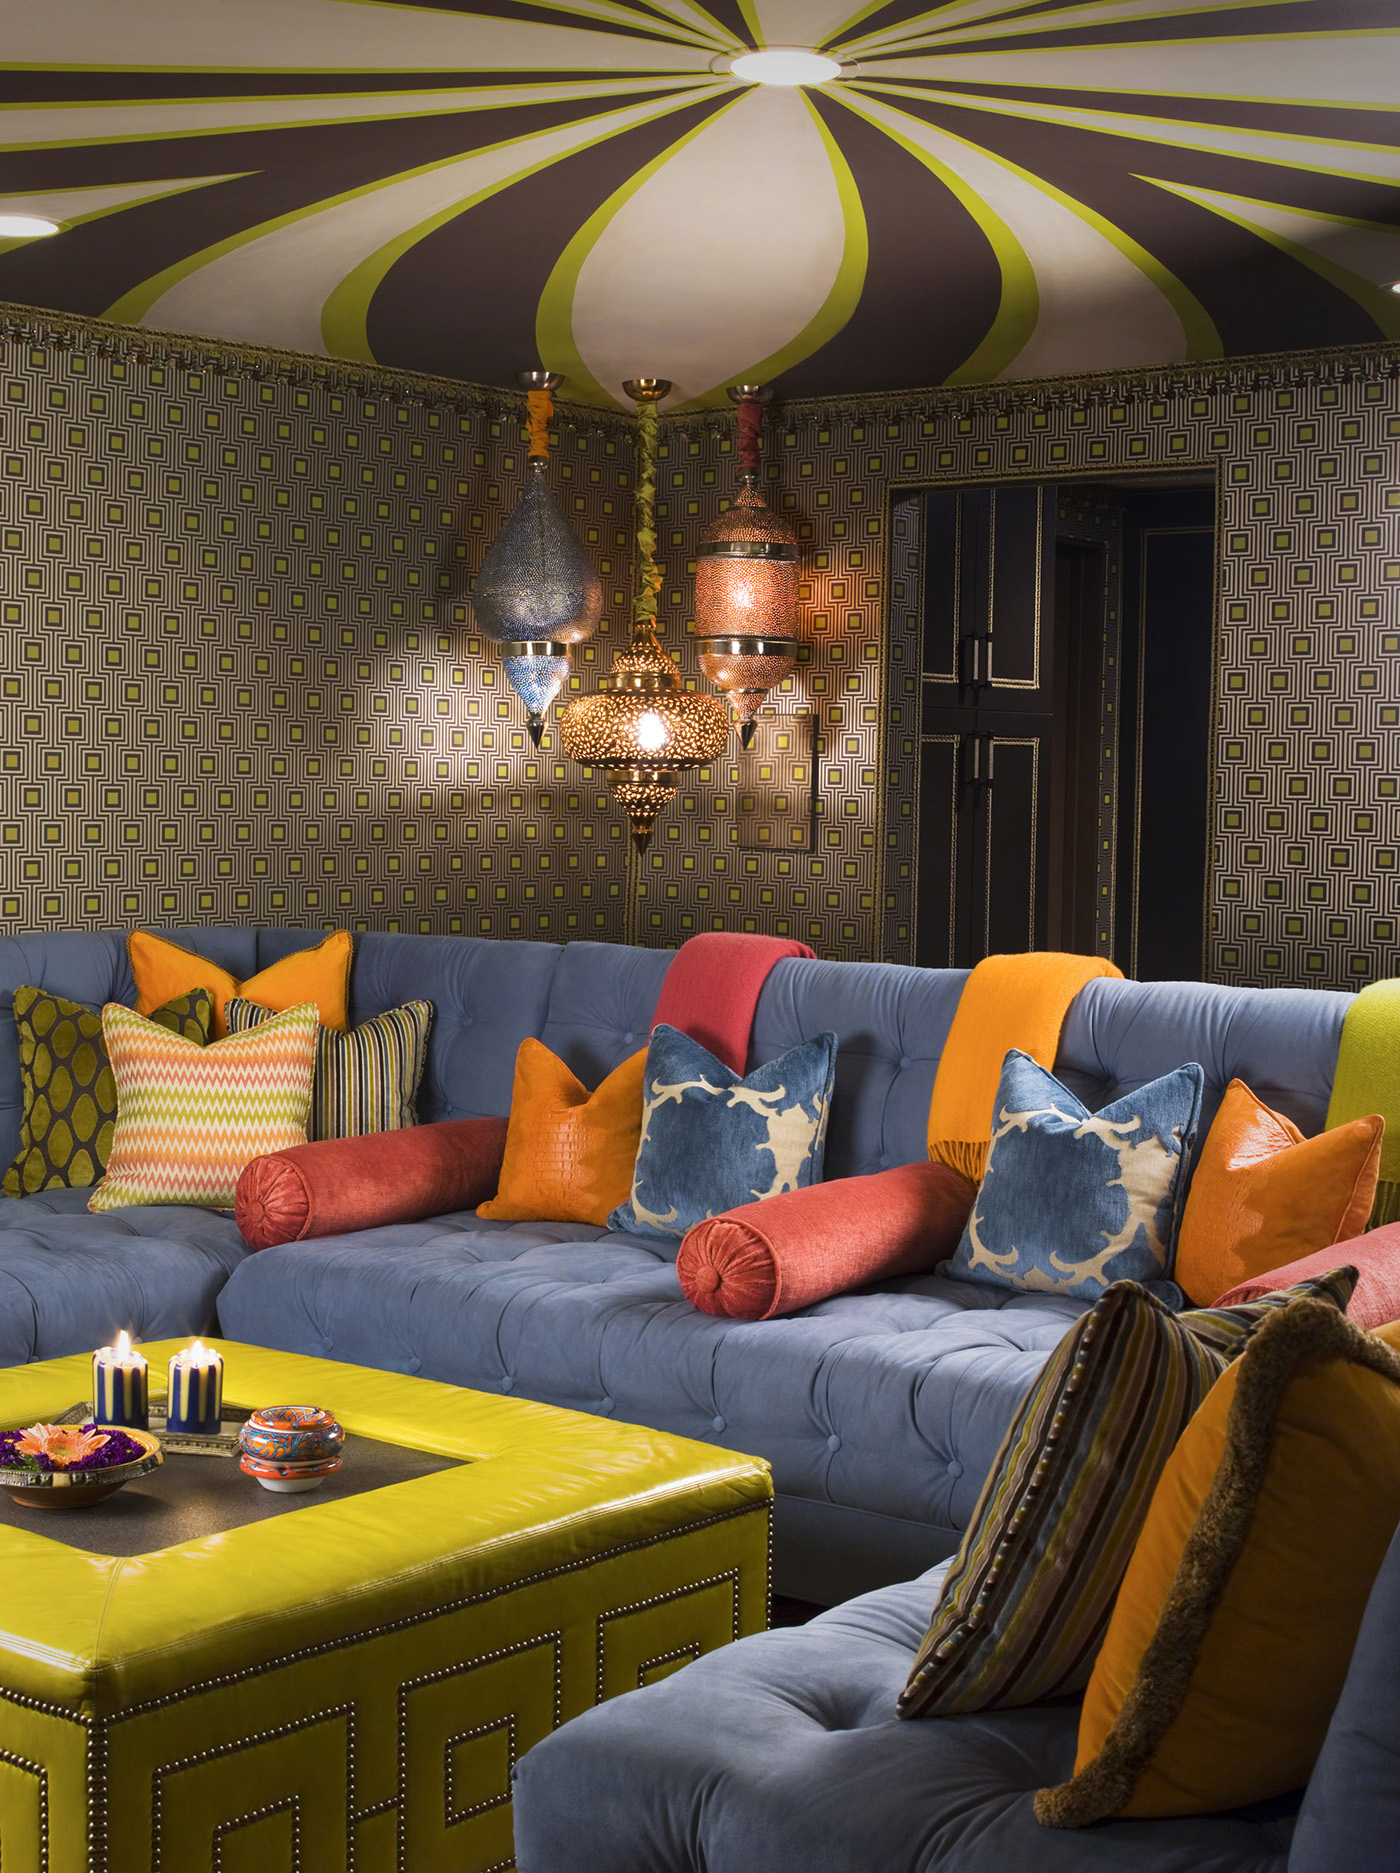 Colorful interior design ideas for media room in our Hip Hacienda